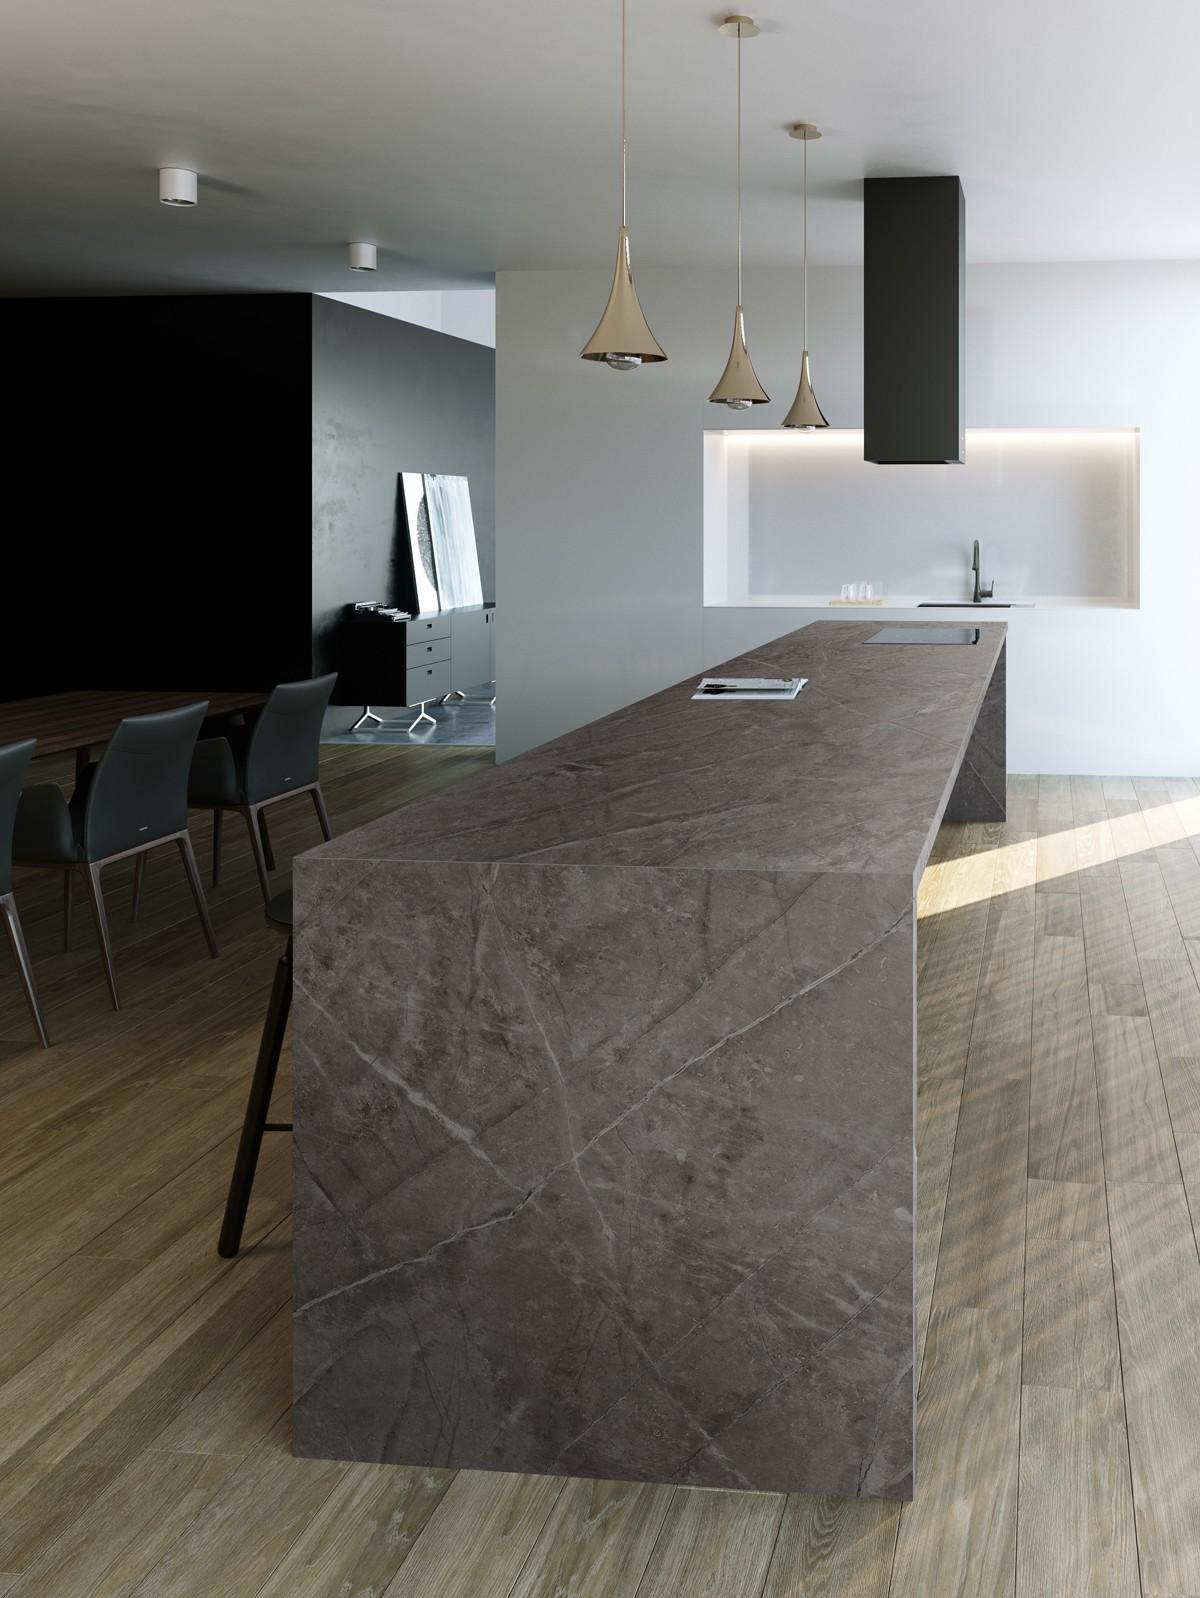 Zelari_Dekton-by-Cosentino_Grupo-Cosentino_piedra-sinterizada_encimeras_arquitectura_interiorismo